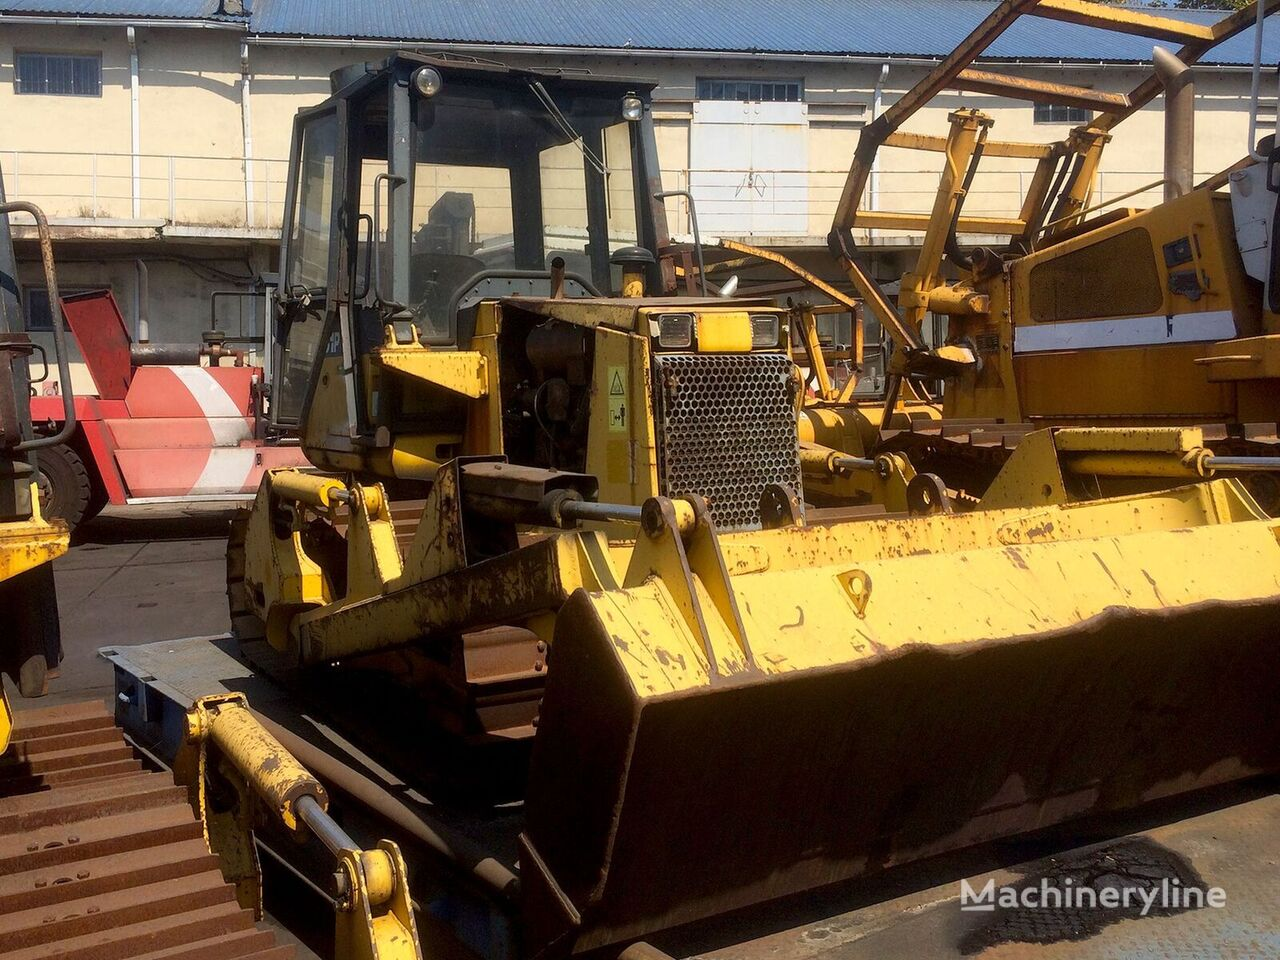 KOMATSU D31P-20 bulldozer